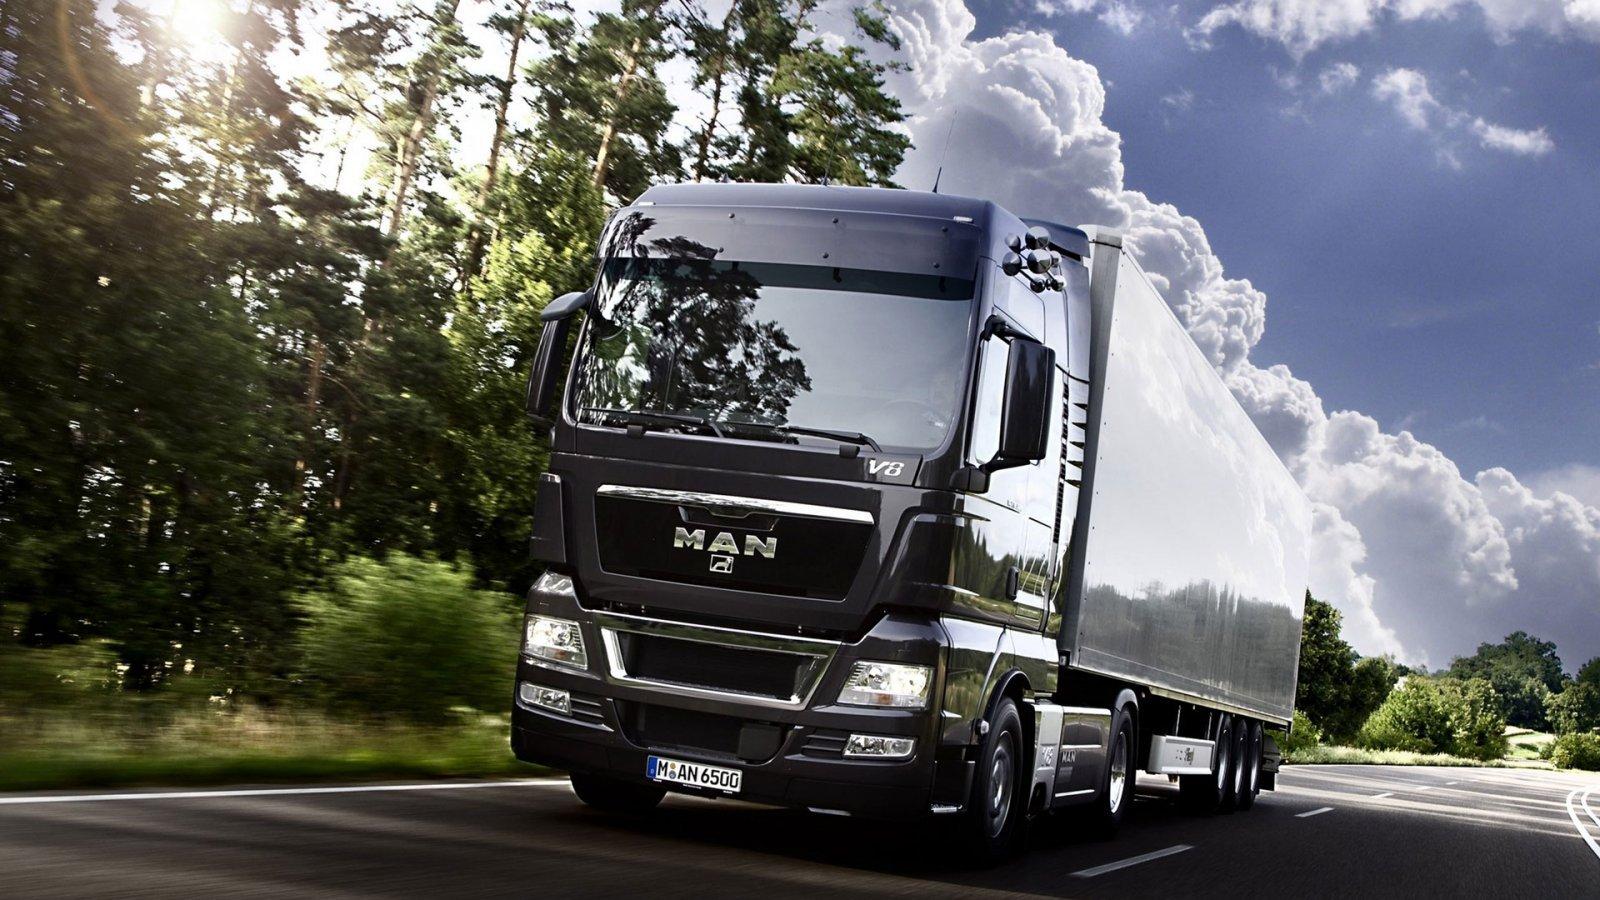 HdeJ Desktop Wallpapers Vehicles028 trucks MAN Truck 1600x900 1600x900